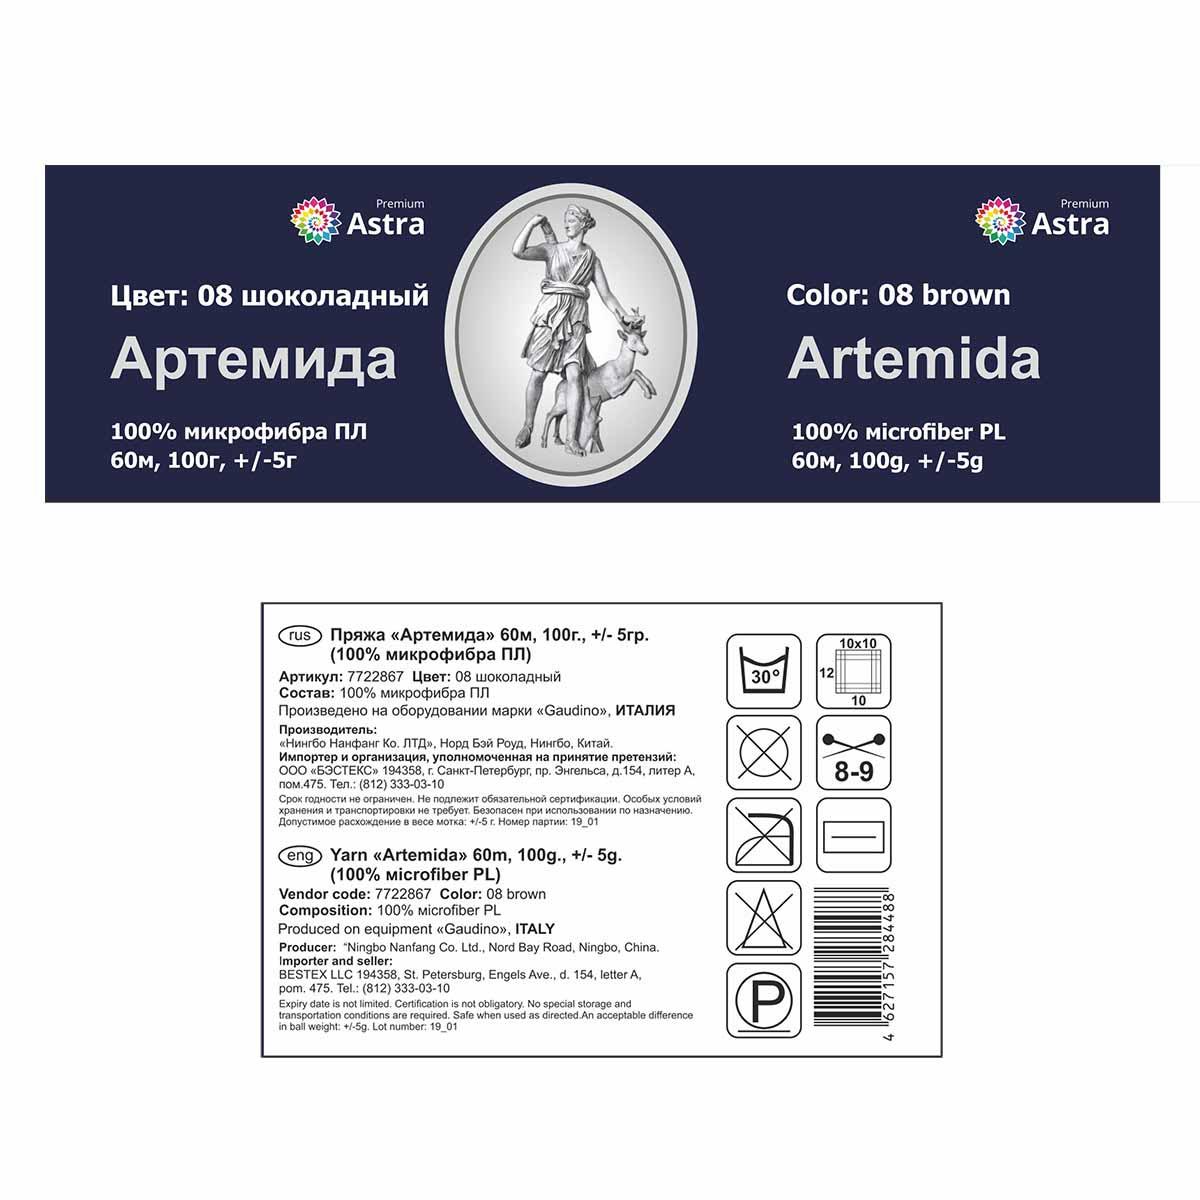 Пряжа Astra Premium 'Артемида' 100гр. 60м (100% микрофибра ПЛ)